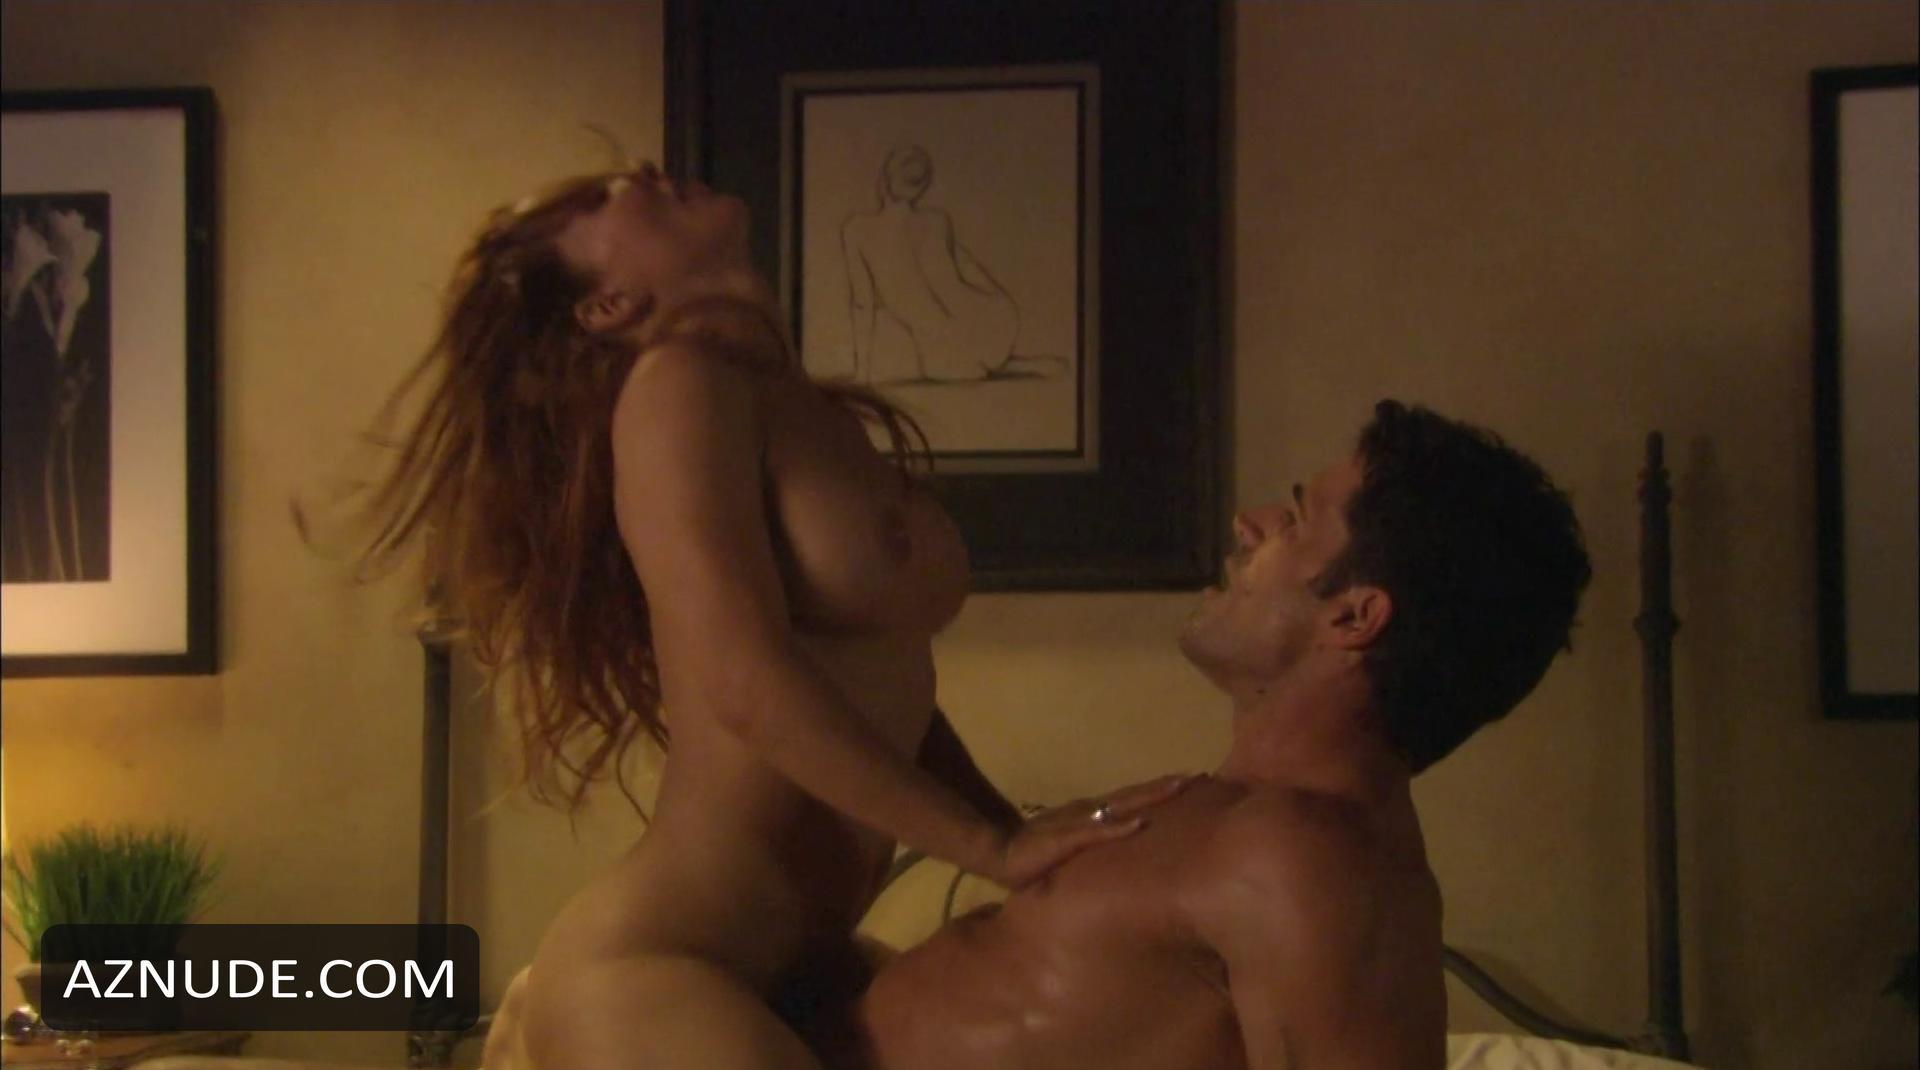 laura lion having sex